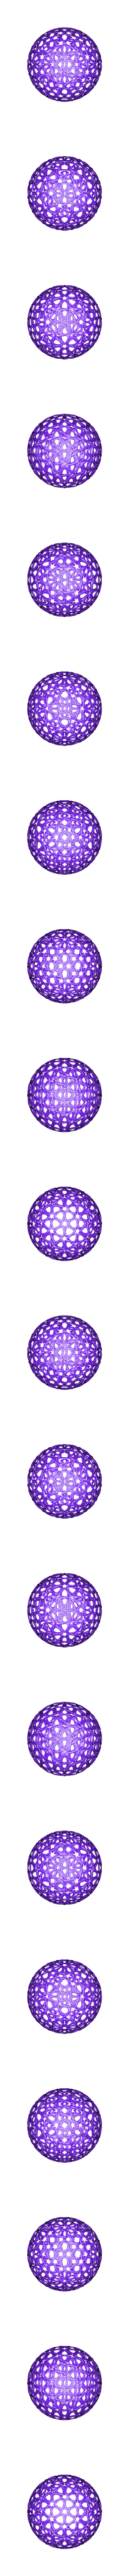 Xmas_Bubble_86mm_Trinckle.stl Download free STL file Islamic Christmas Ball • 3D printer template, bza